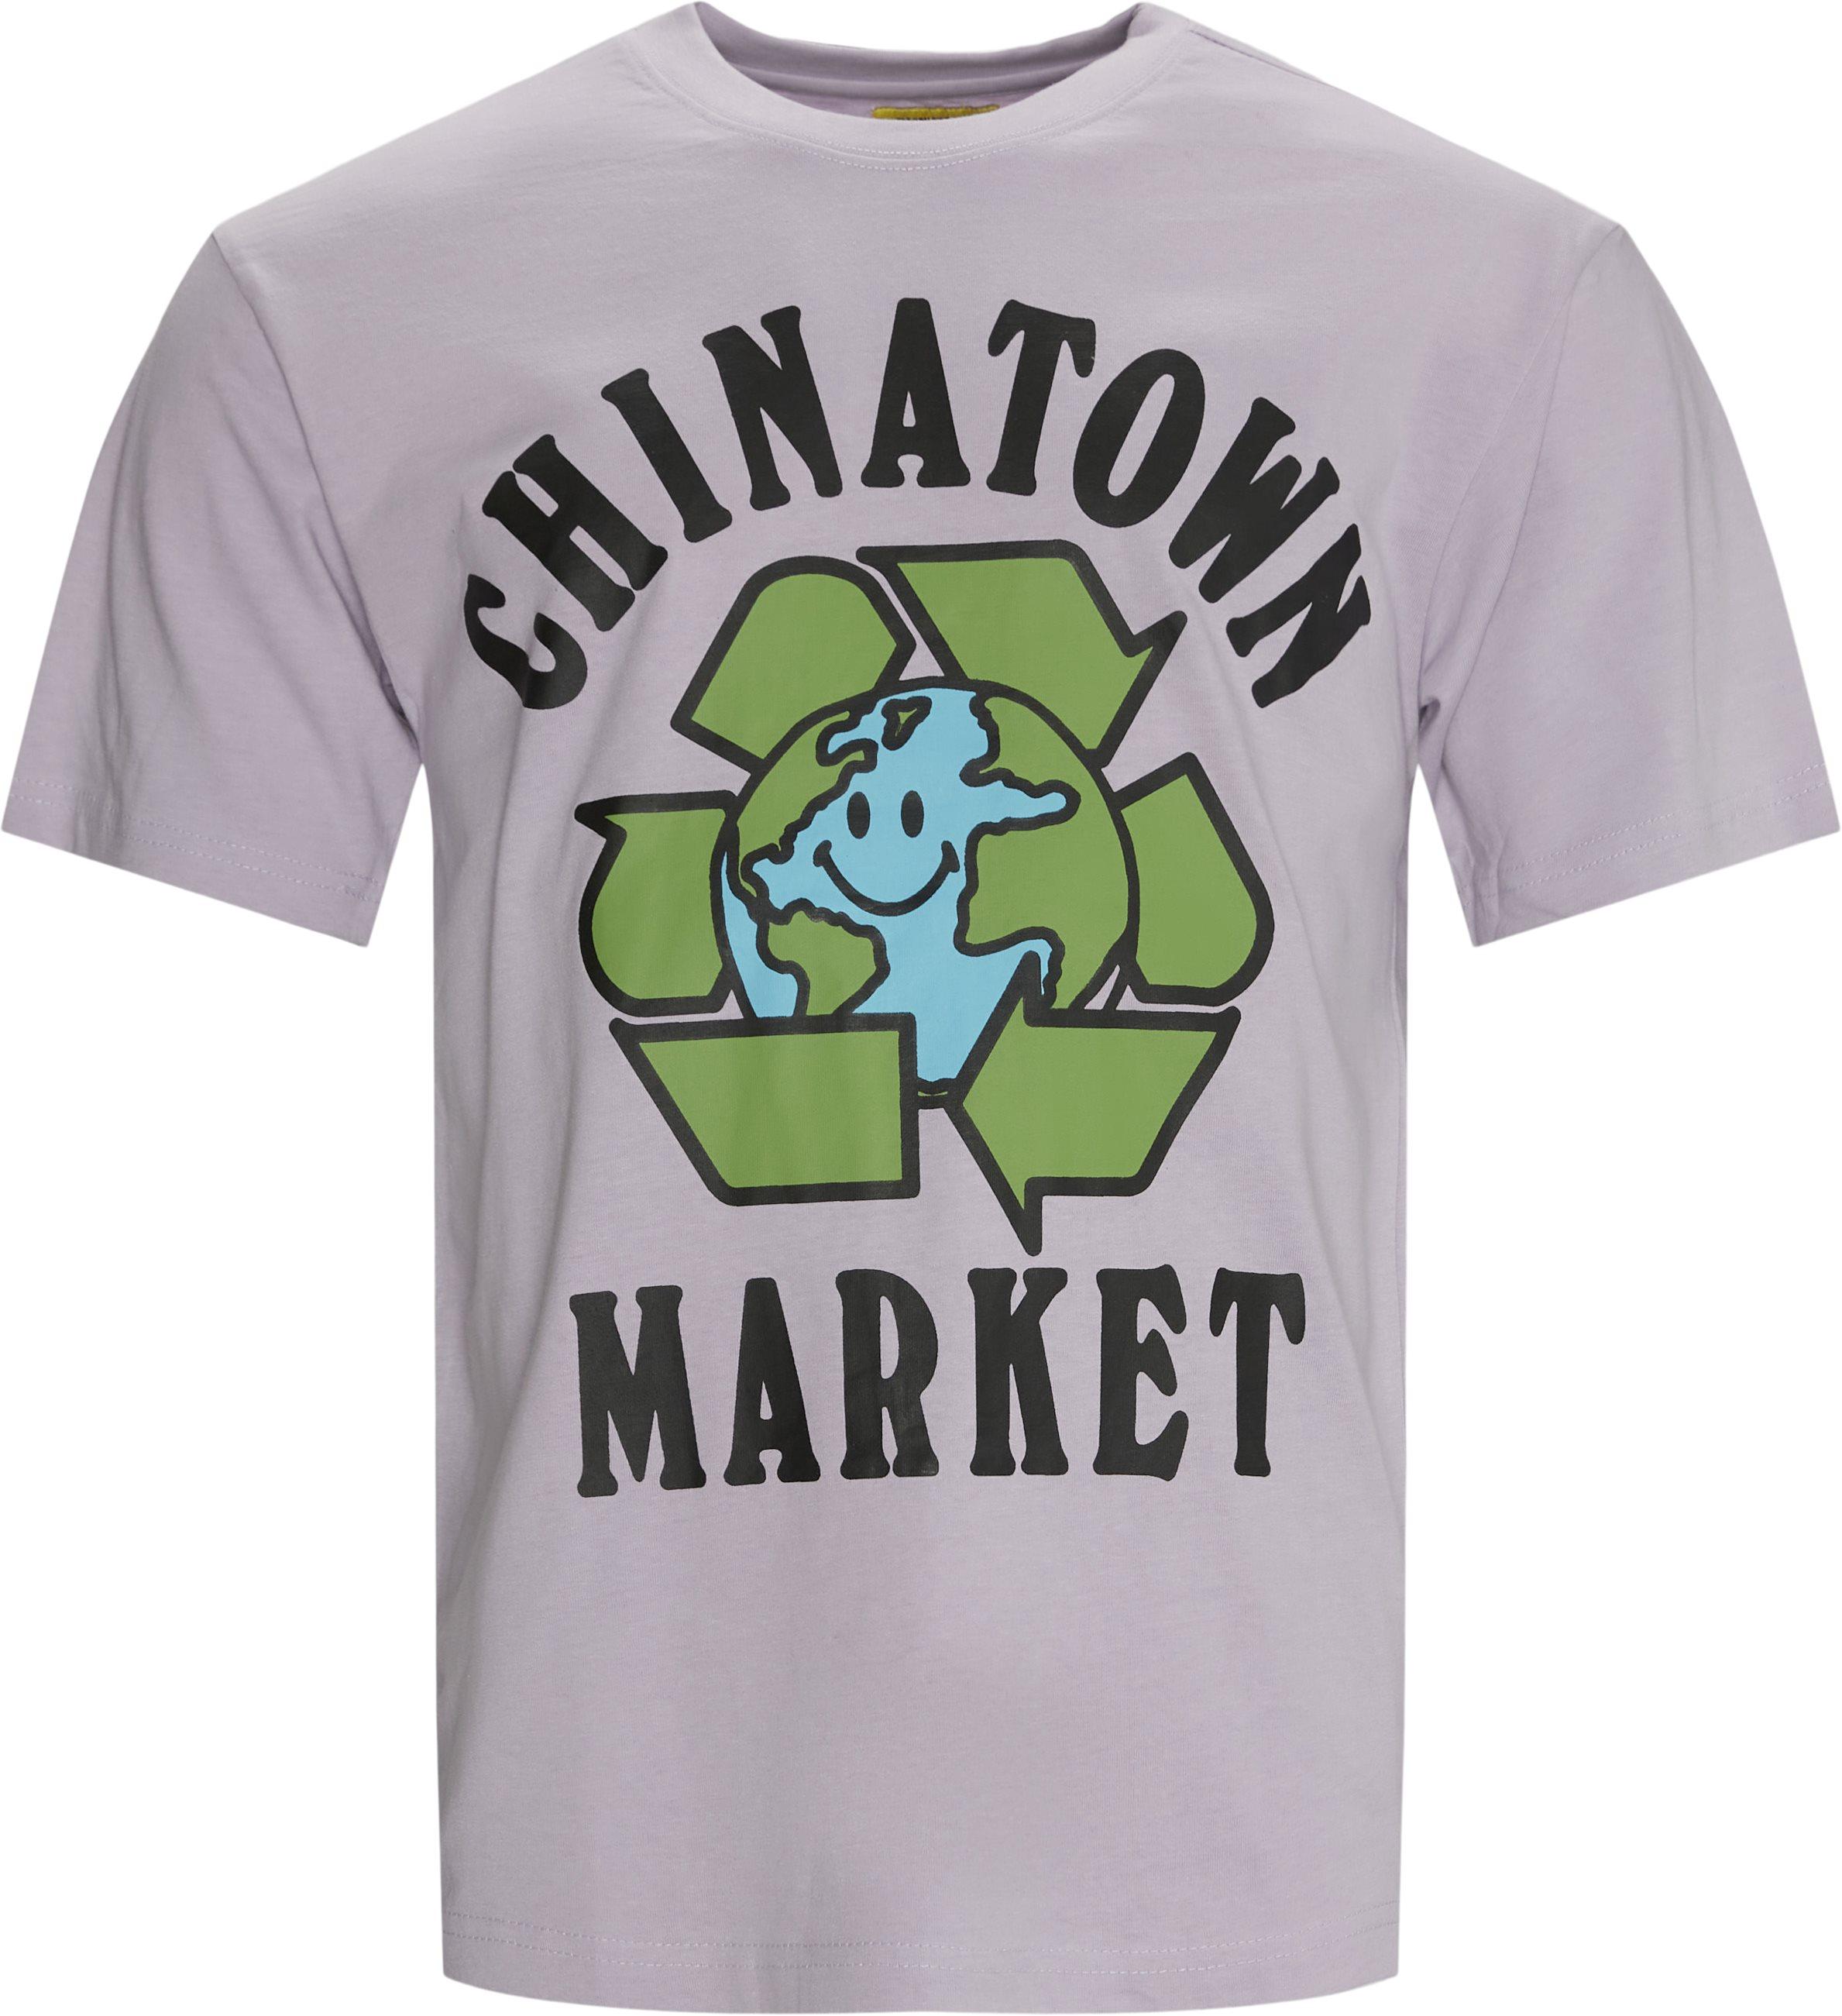 RECYCLE GLOBAL t-shirt - T-shirts - Regular fit - Lilla